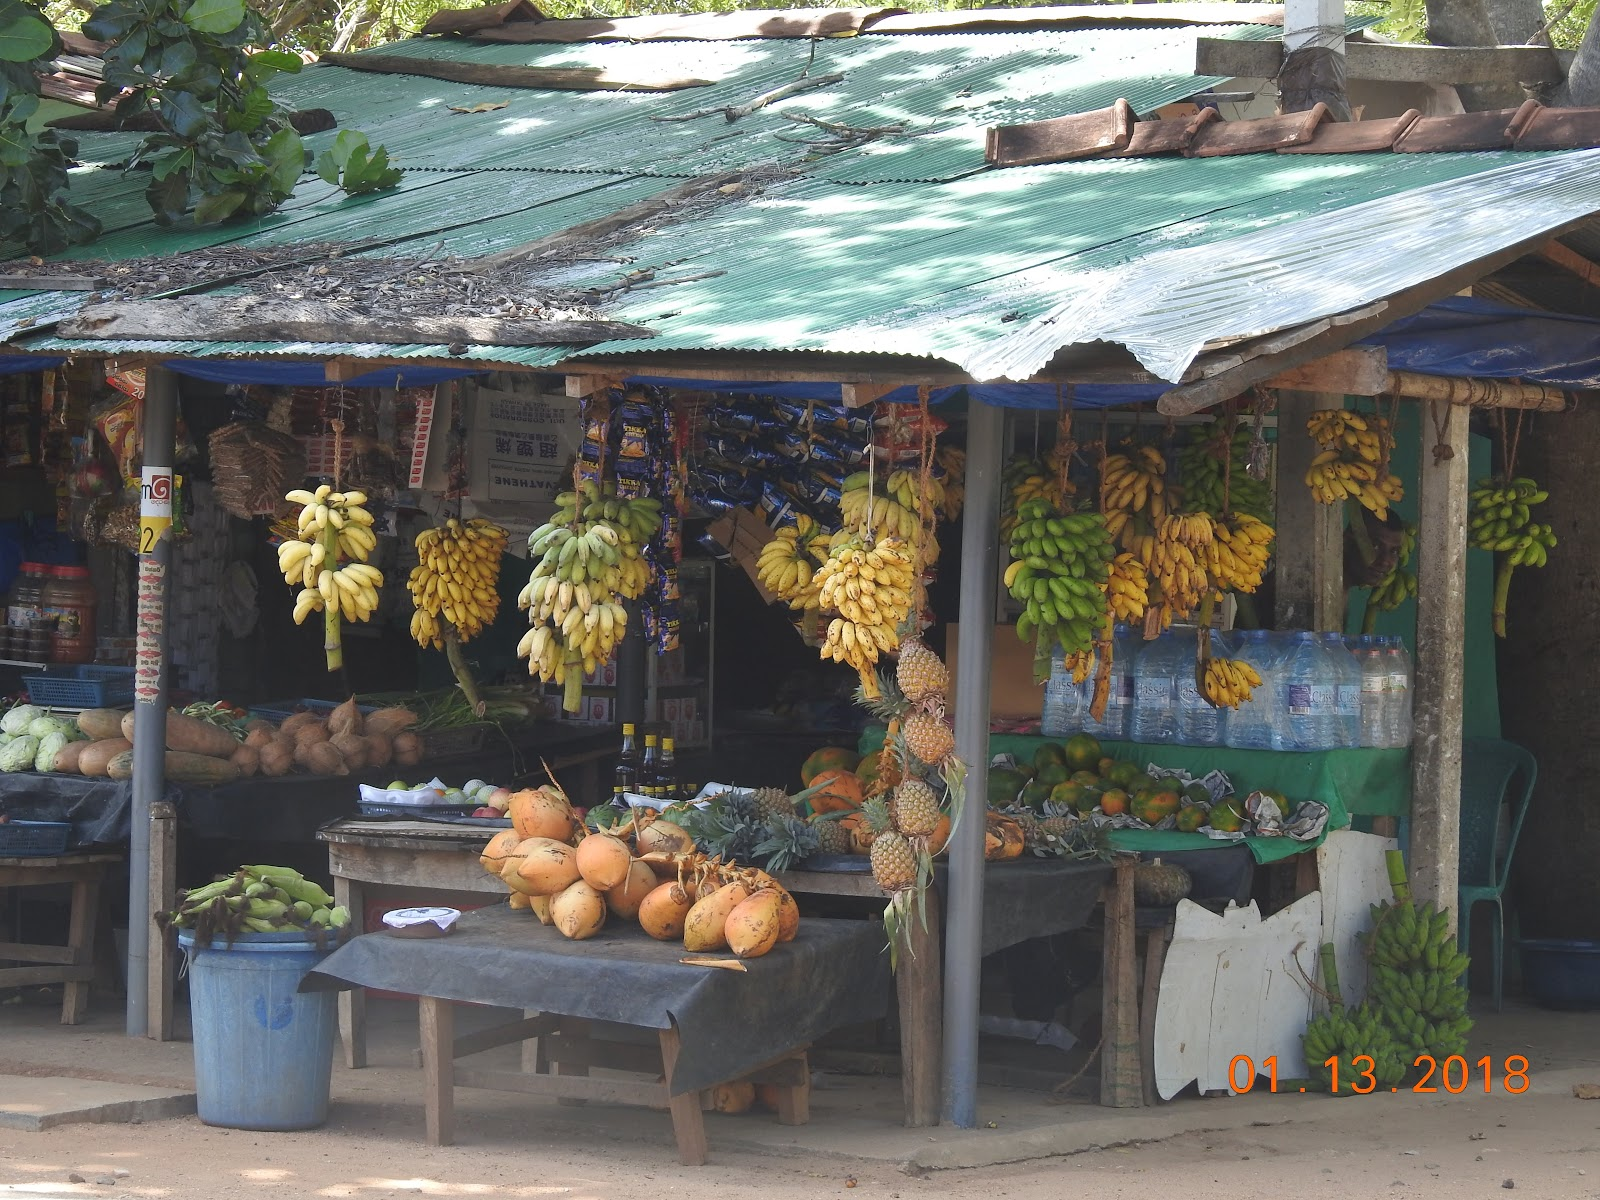 invite-to-paradise-sri-lanka-maldives-holiday-specialists-nutan-vidyut-patel-fruit-stall.jpg